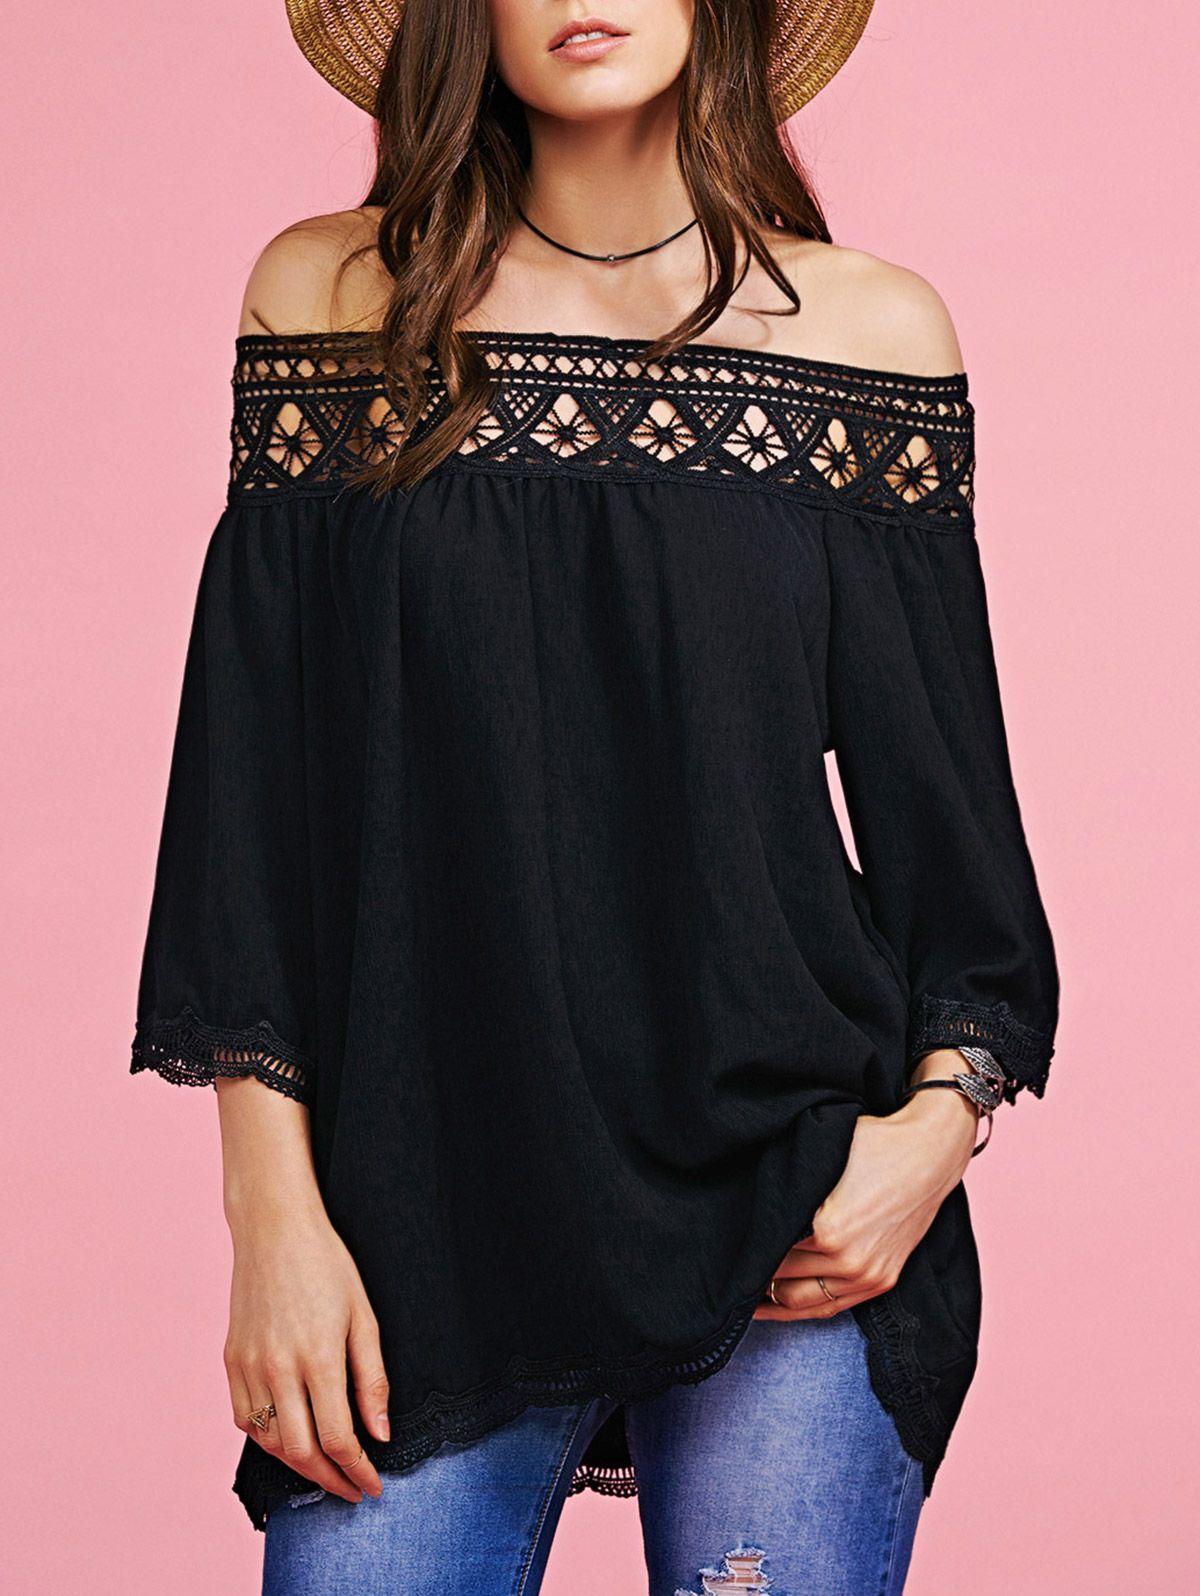 Stylish Off The Shoulder Cut Out Blouse For Women | Shoulder ...